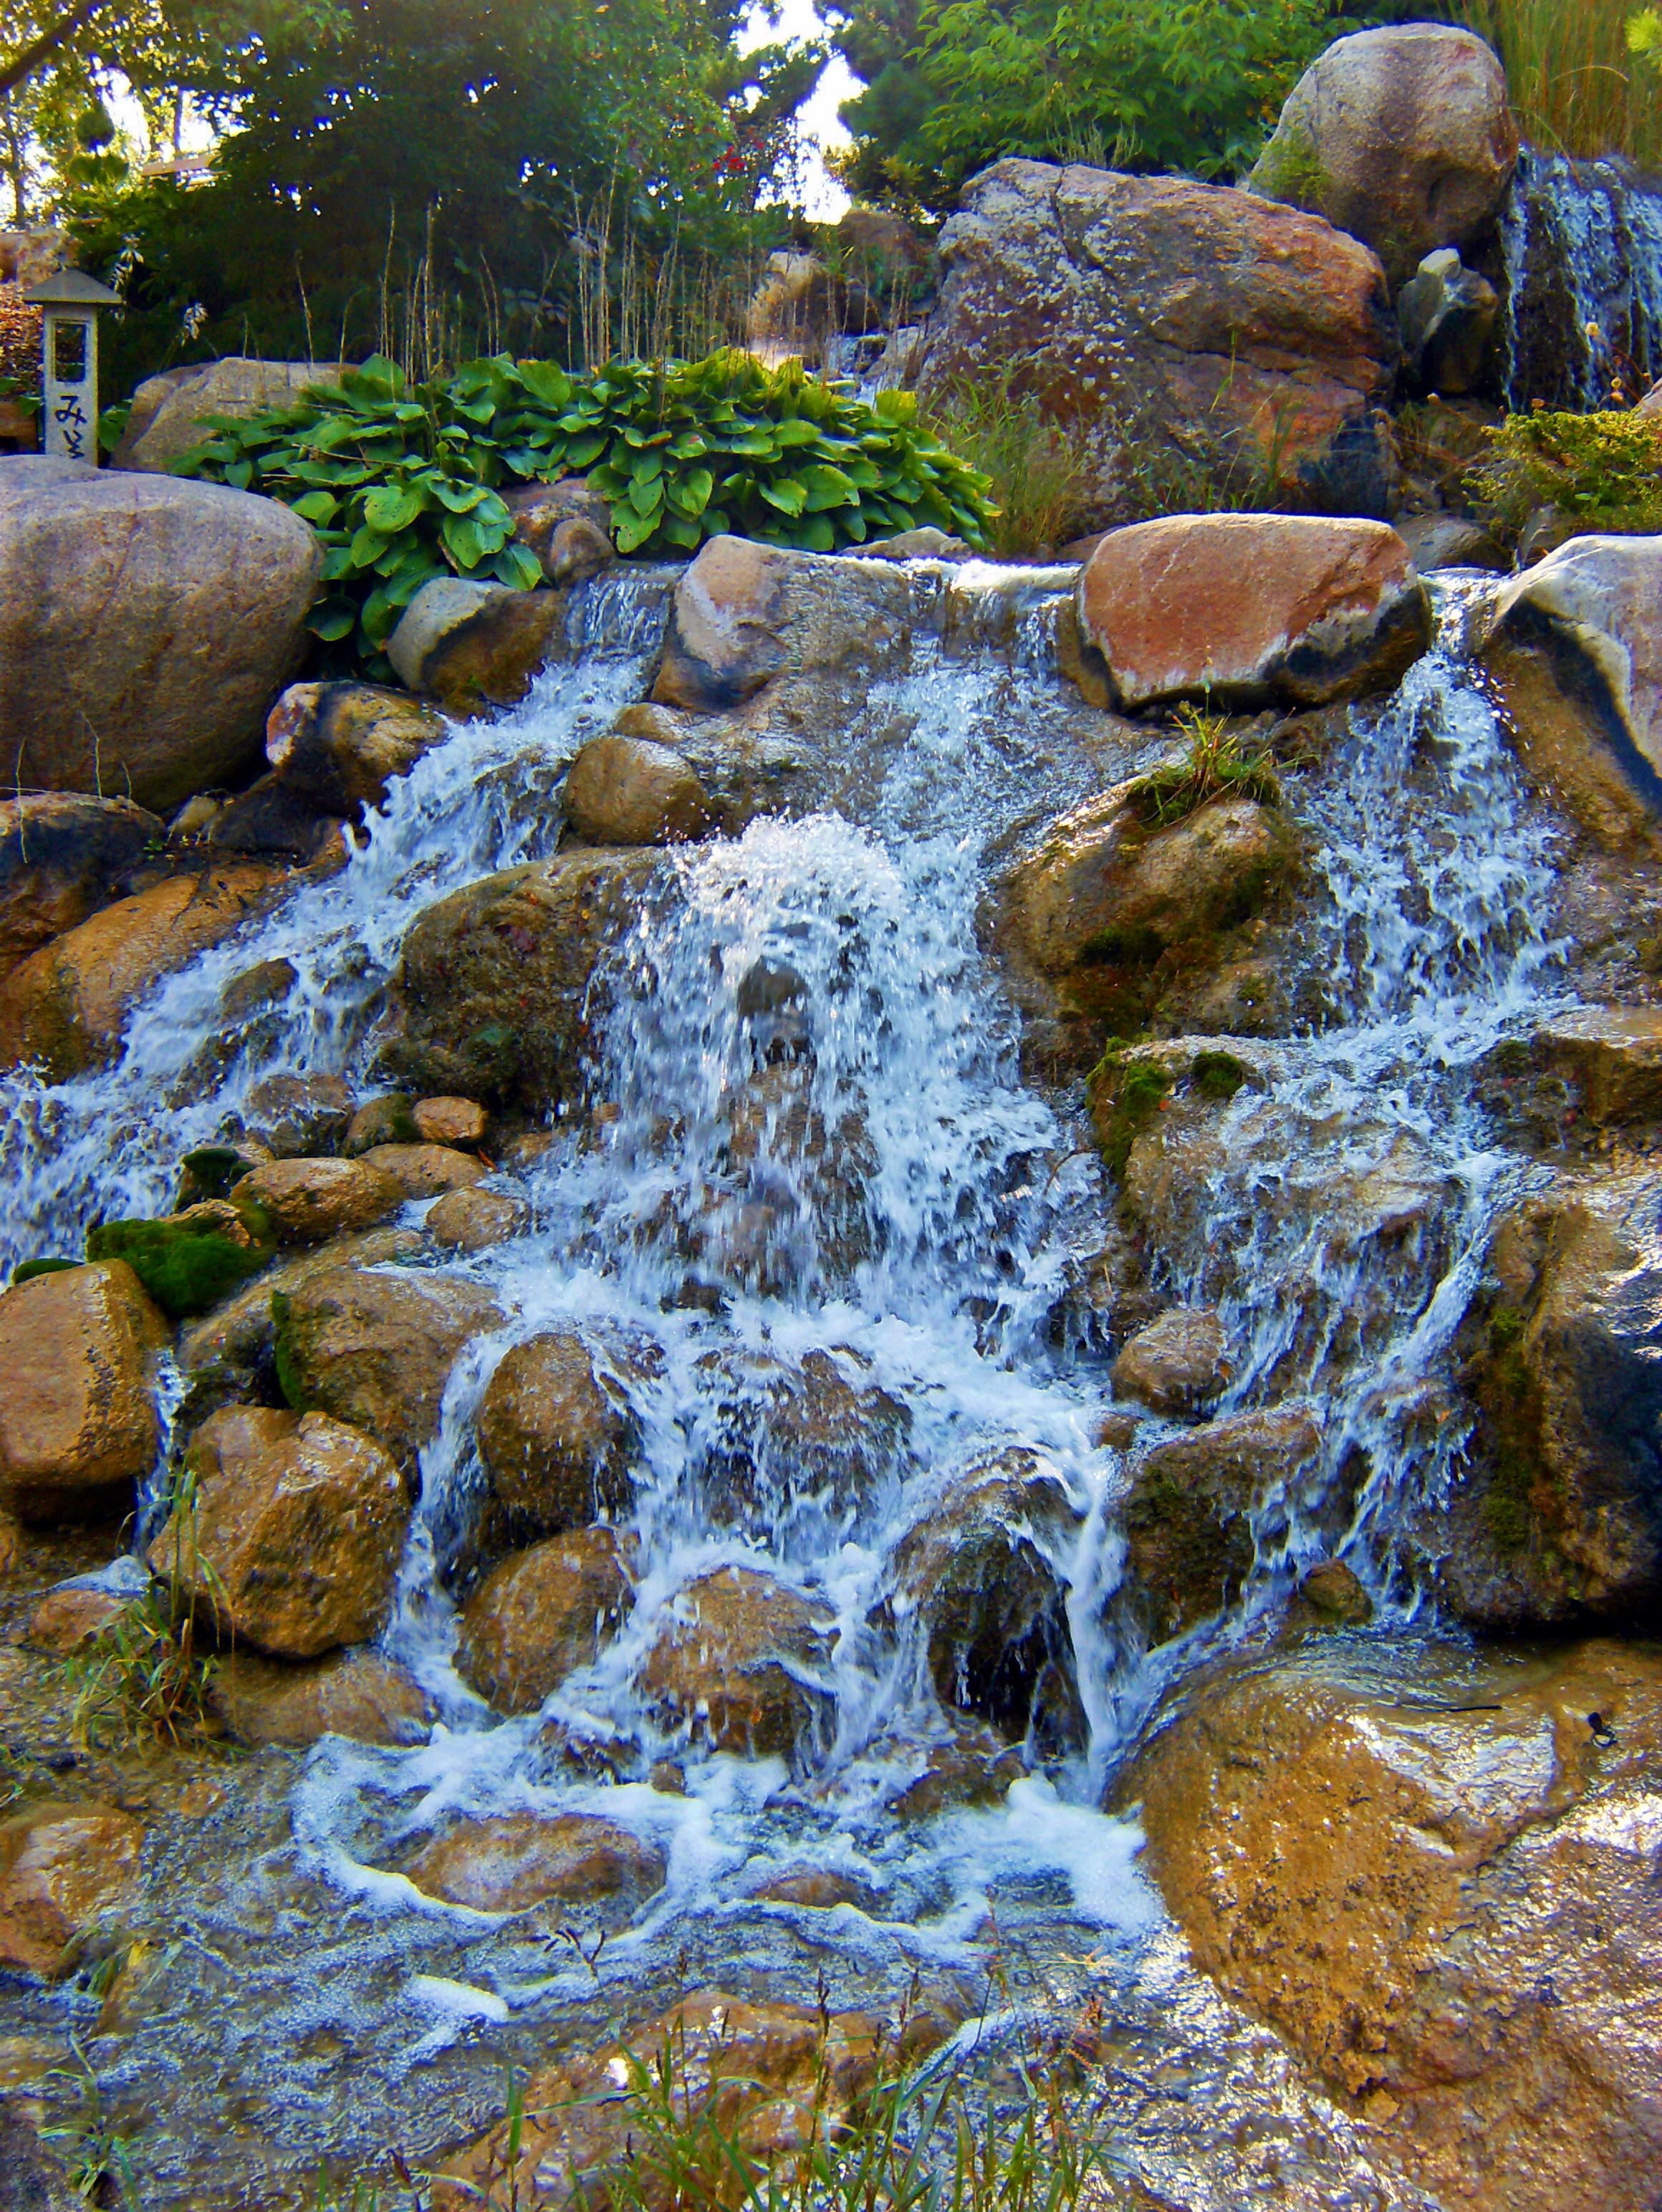 File:Waterfall at Japanese Water Garden.jpg - Wikimedia Commons